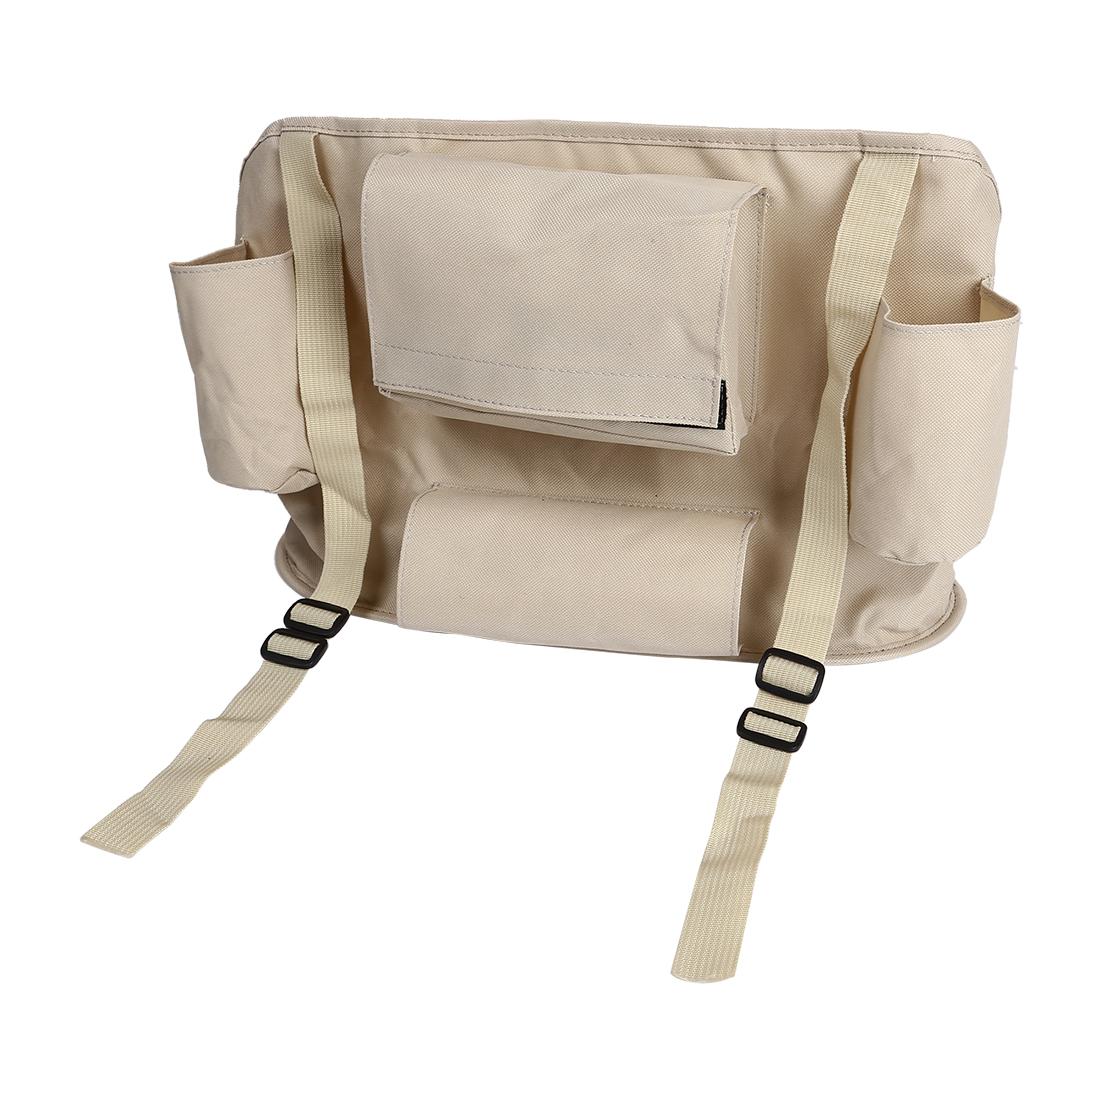 Beige Car Vehicle Back Seat Organizer Holder Travel Storage Bag Multi-Pocket